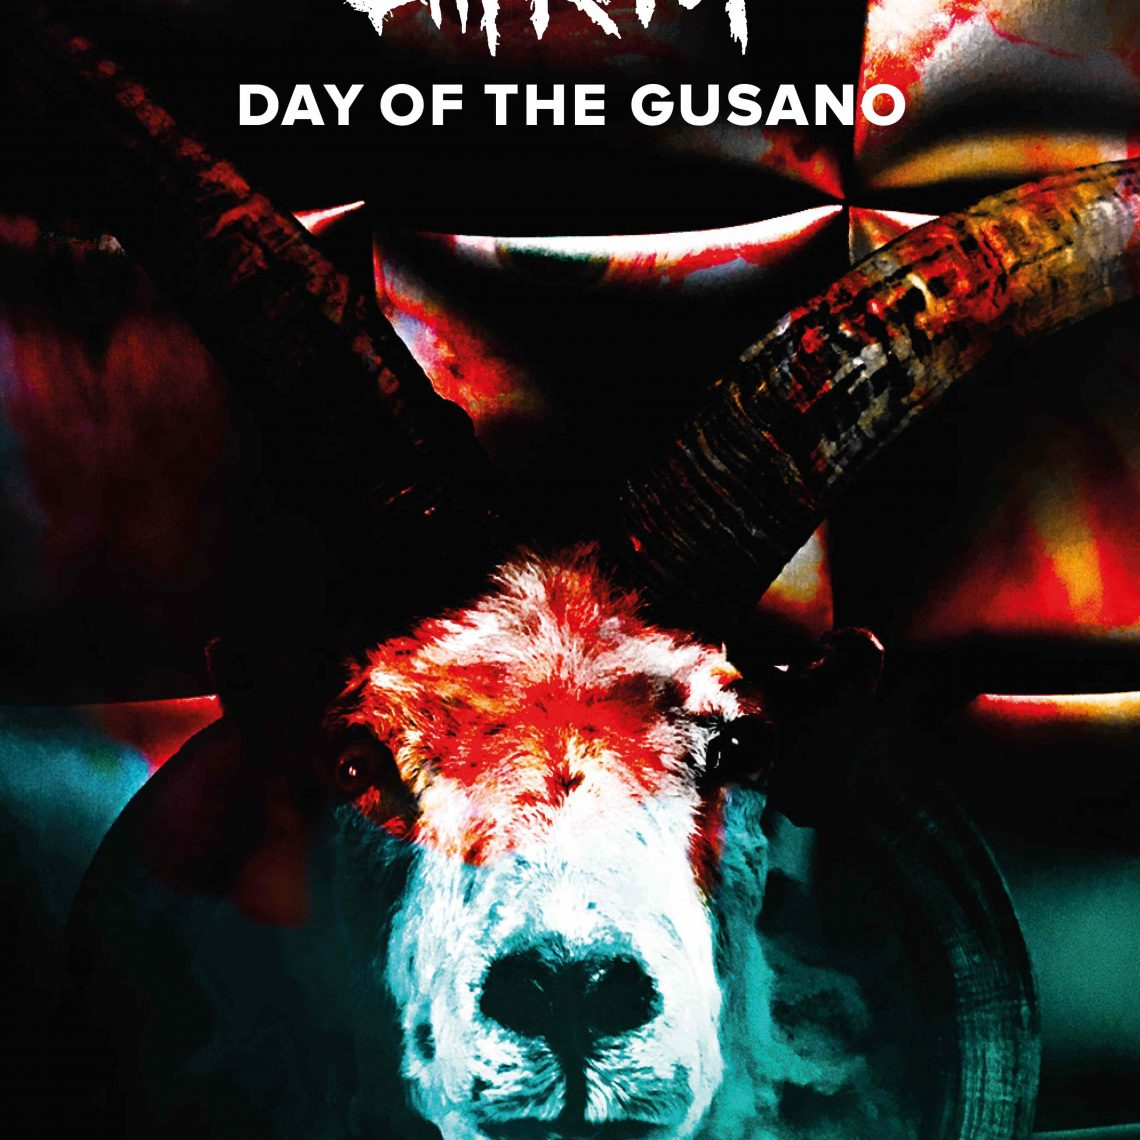 SLIPKNOT announce 'Day Of The Gusano' documentary cinema release